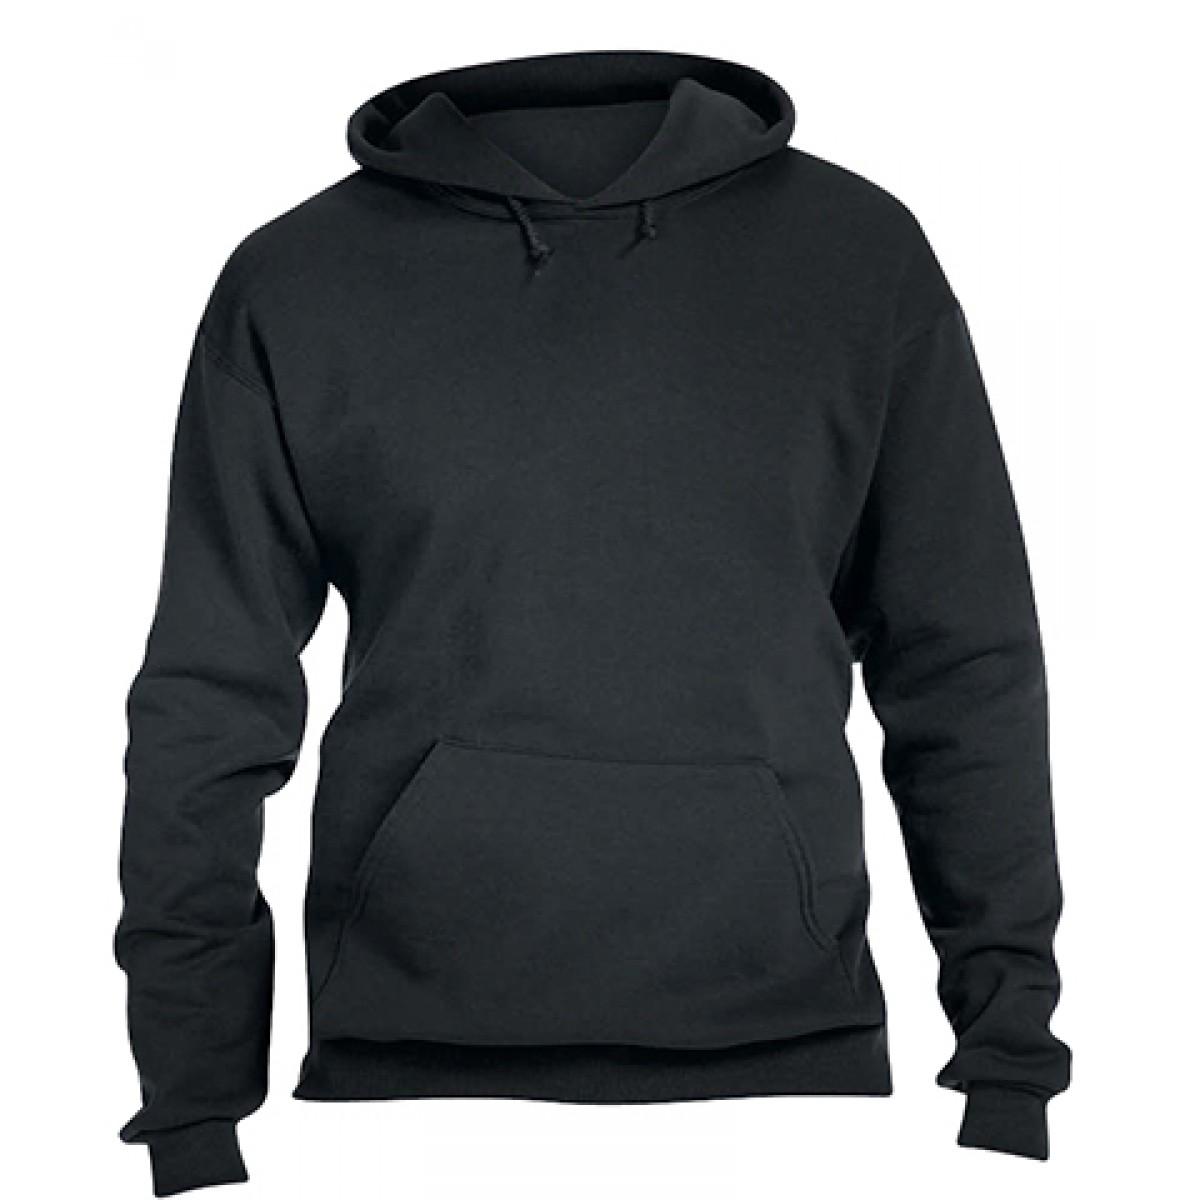 Pullover Hood 50/50 Preshrunk Fleece-Black-S